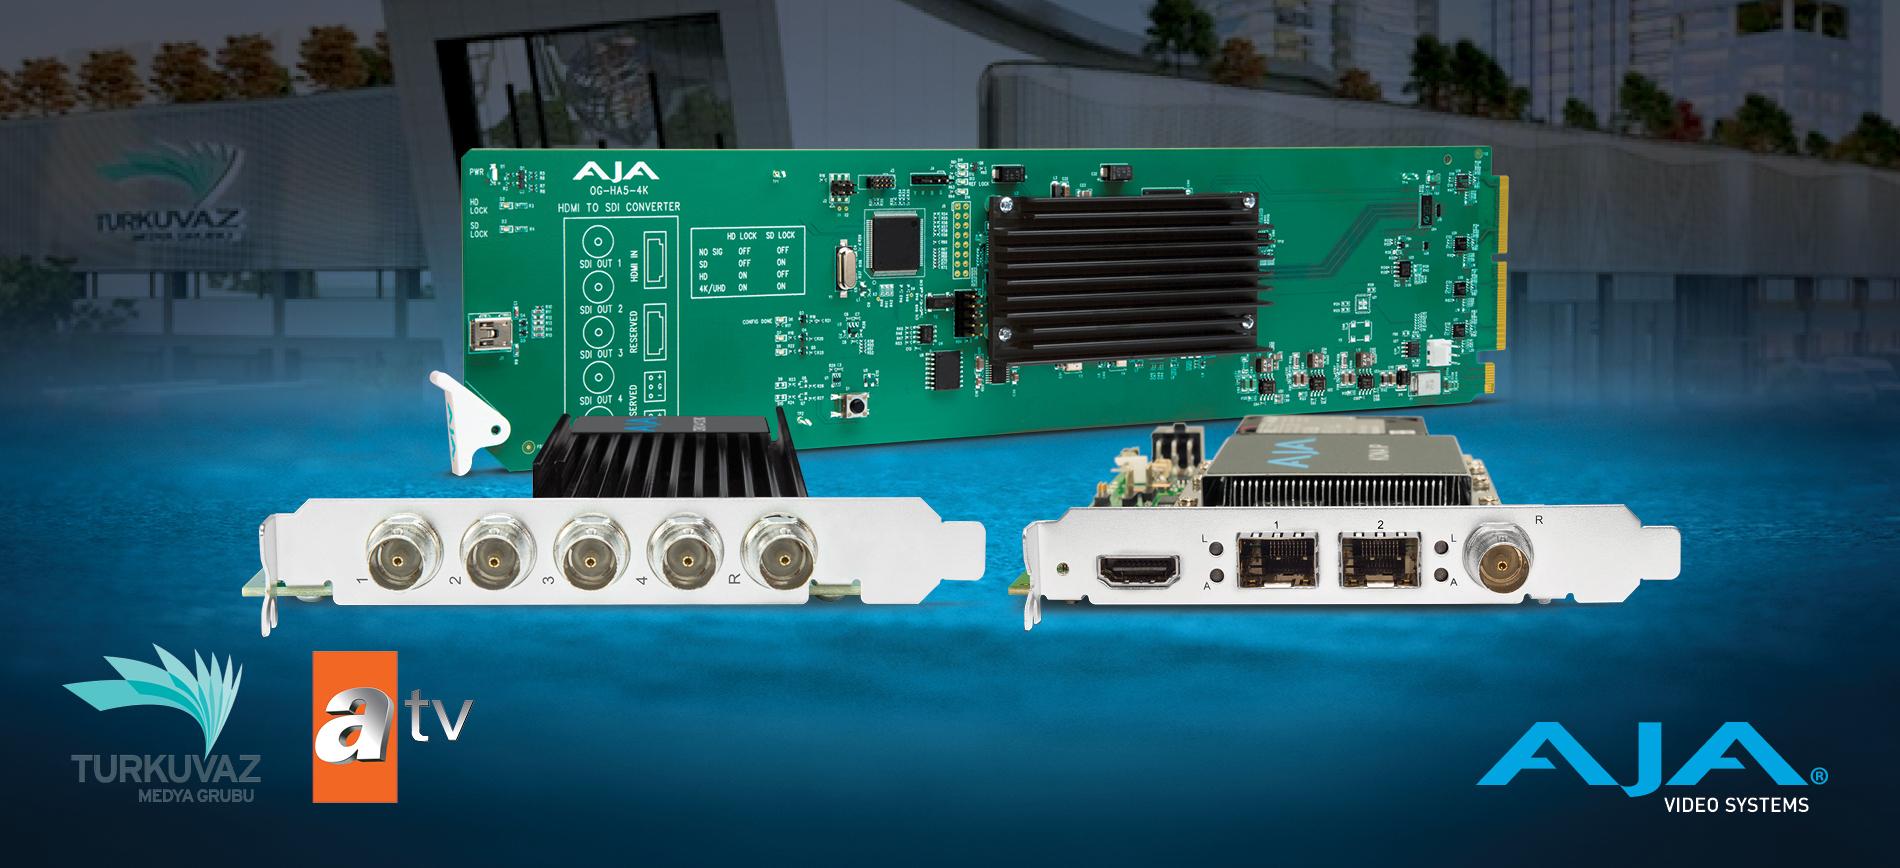 AVITENG Deploys Hybrid Baseband/IP Architecture for Turkey's ATV Broadcast Network with AJA Solutions